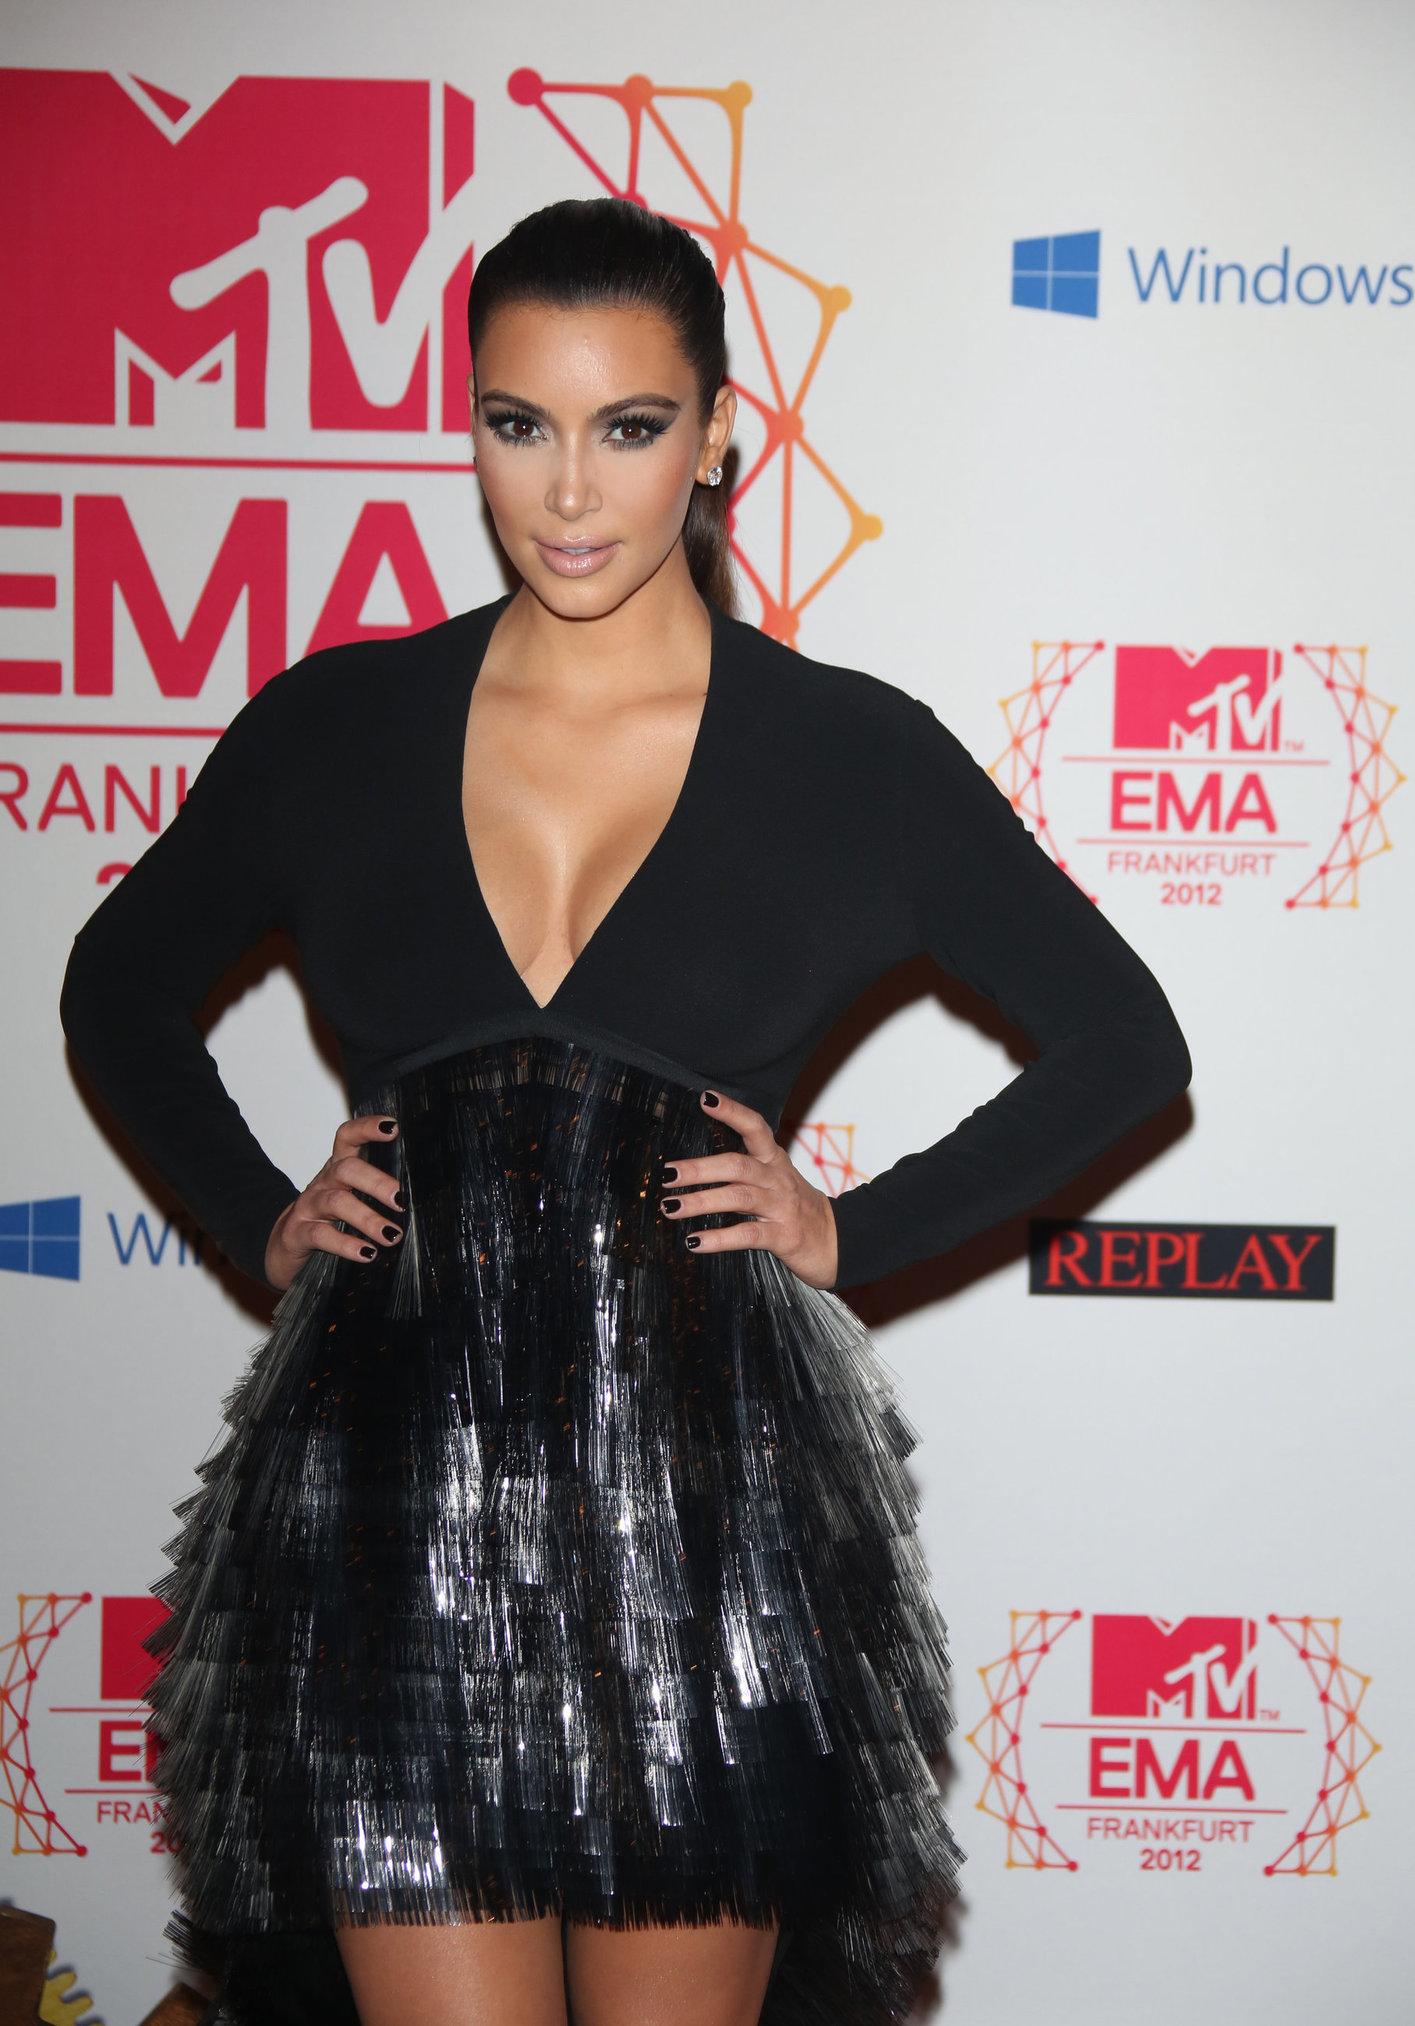 Kim Kardashian MTV EMA's 2012 Frankfurt November 11, 2012